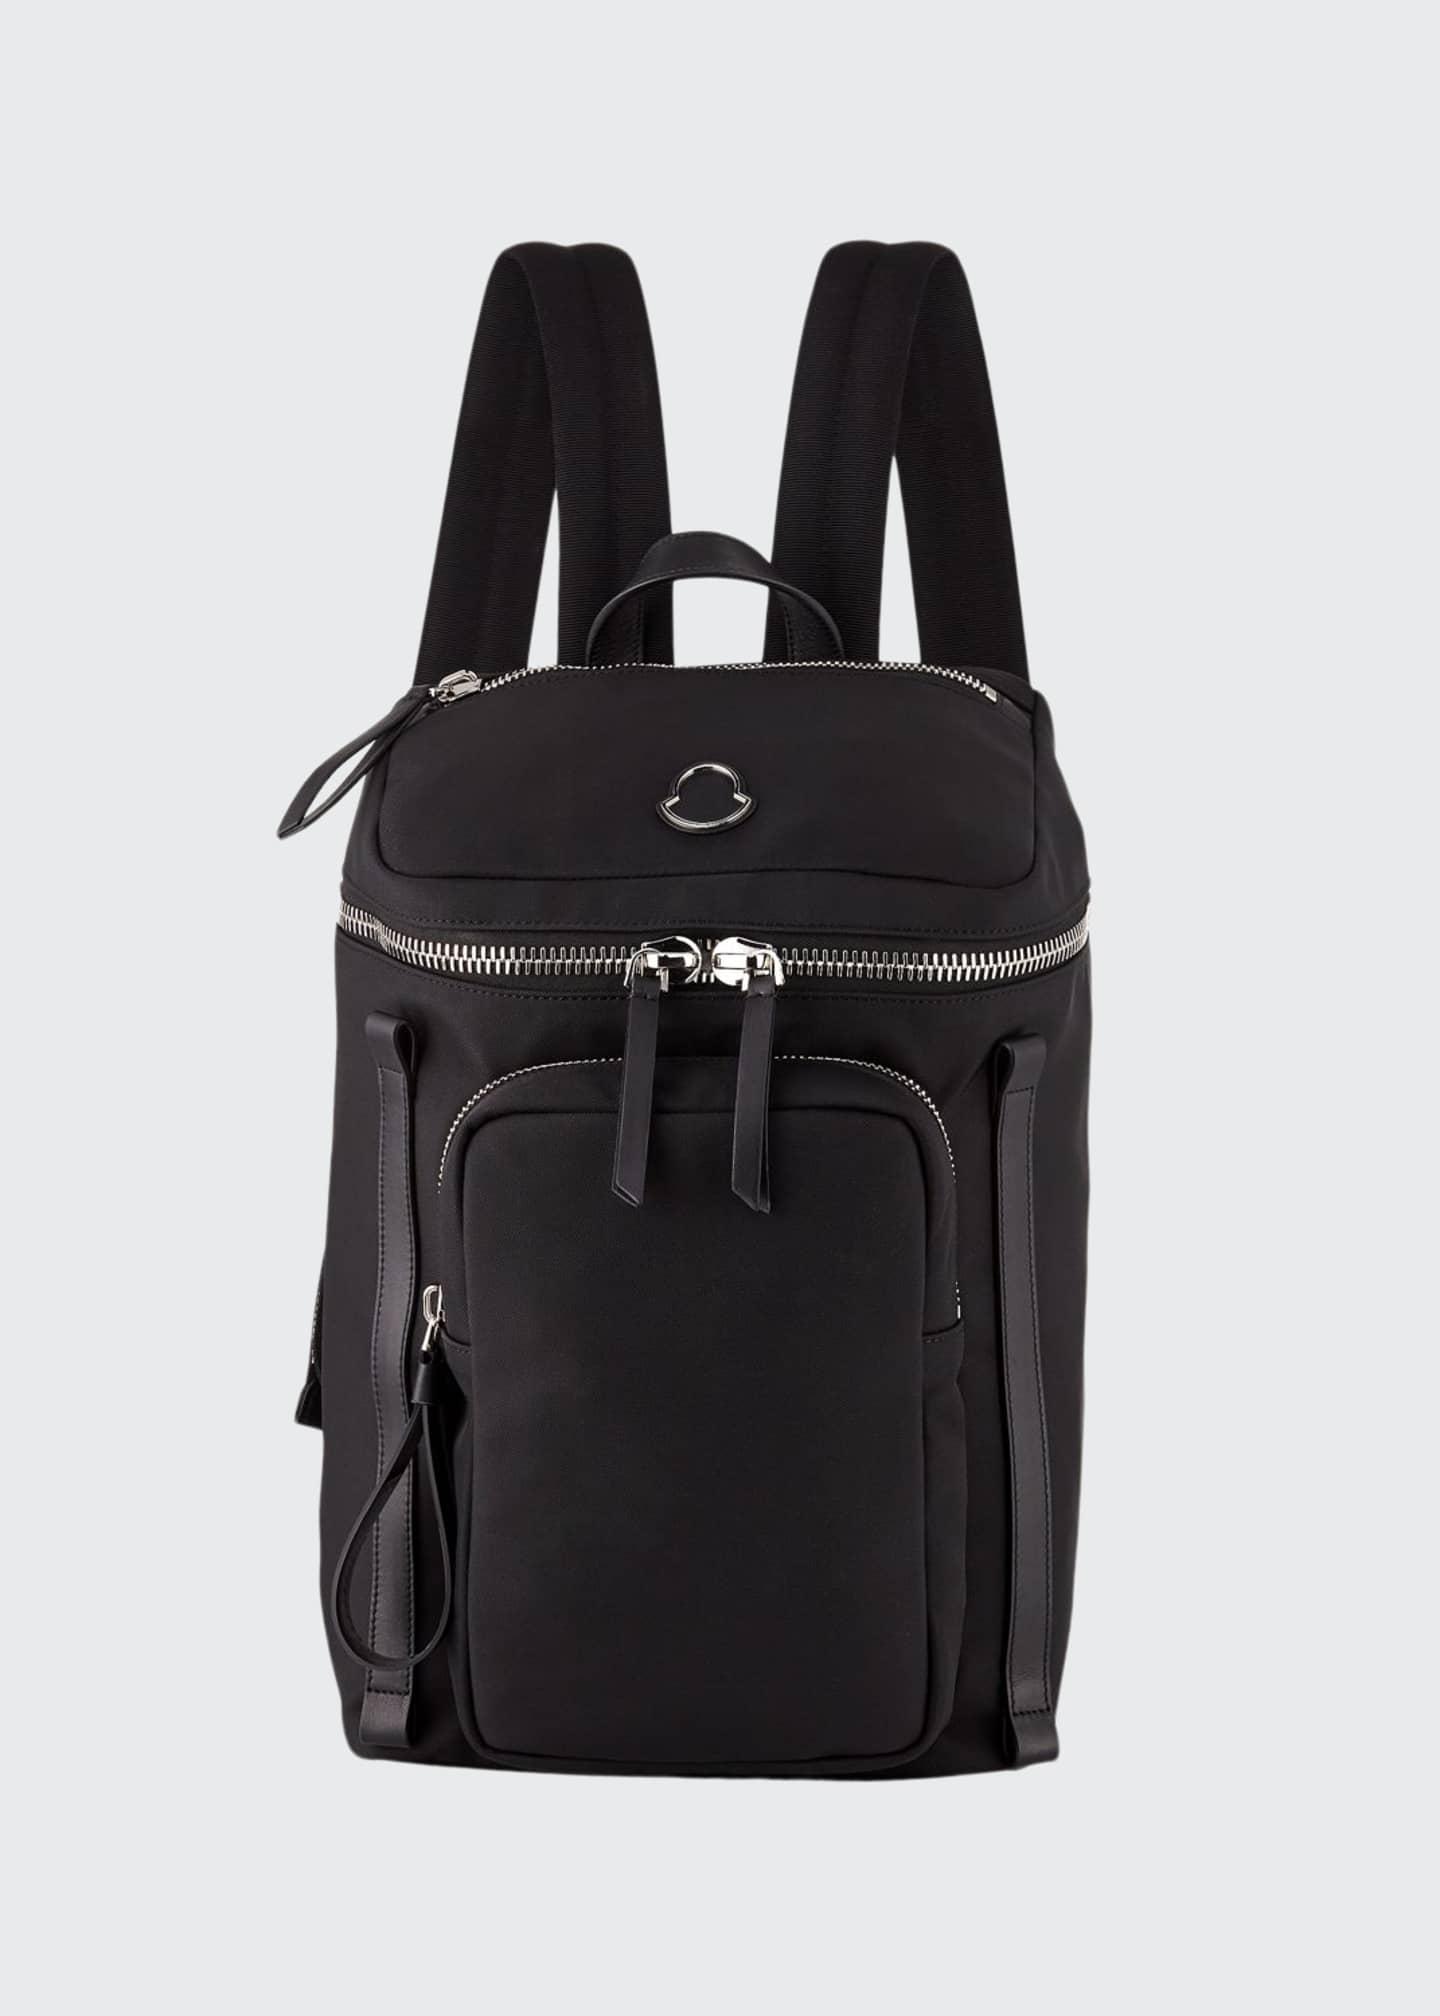 Moncler New Yannick Nylon Canvas Backpack